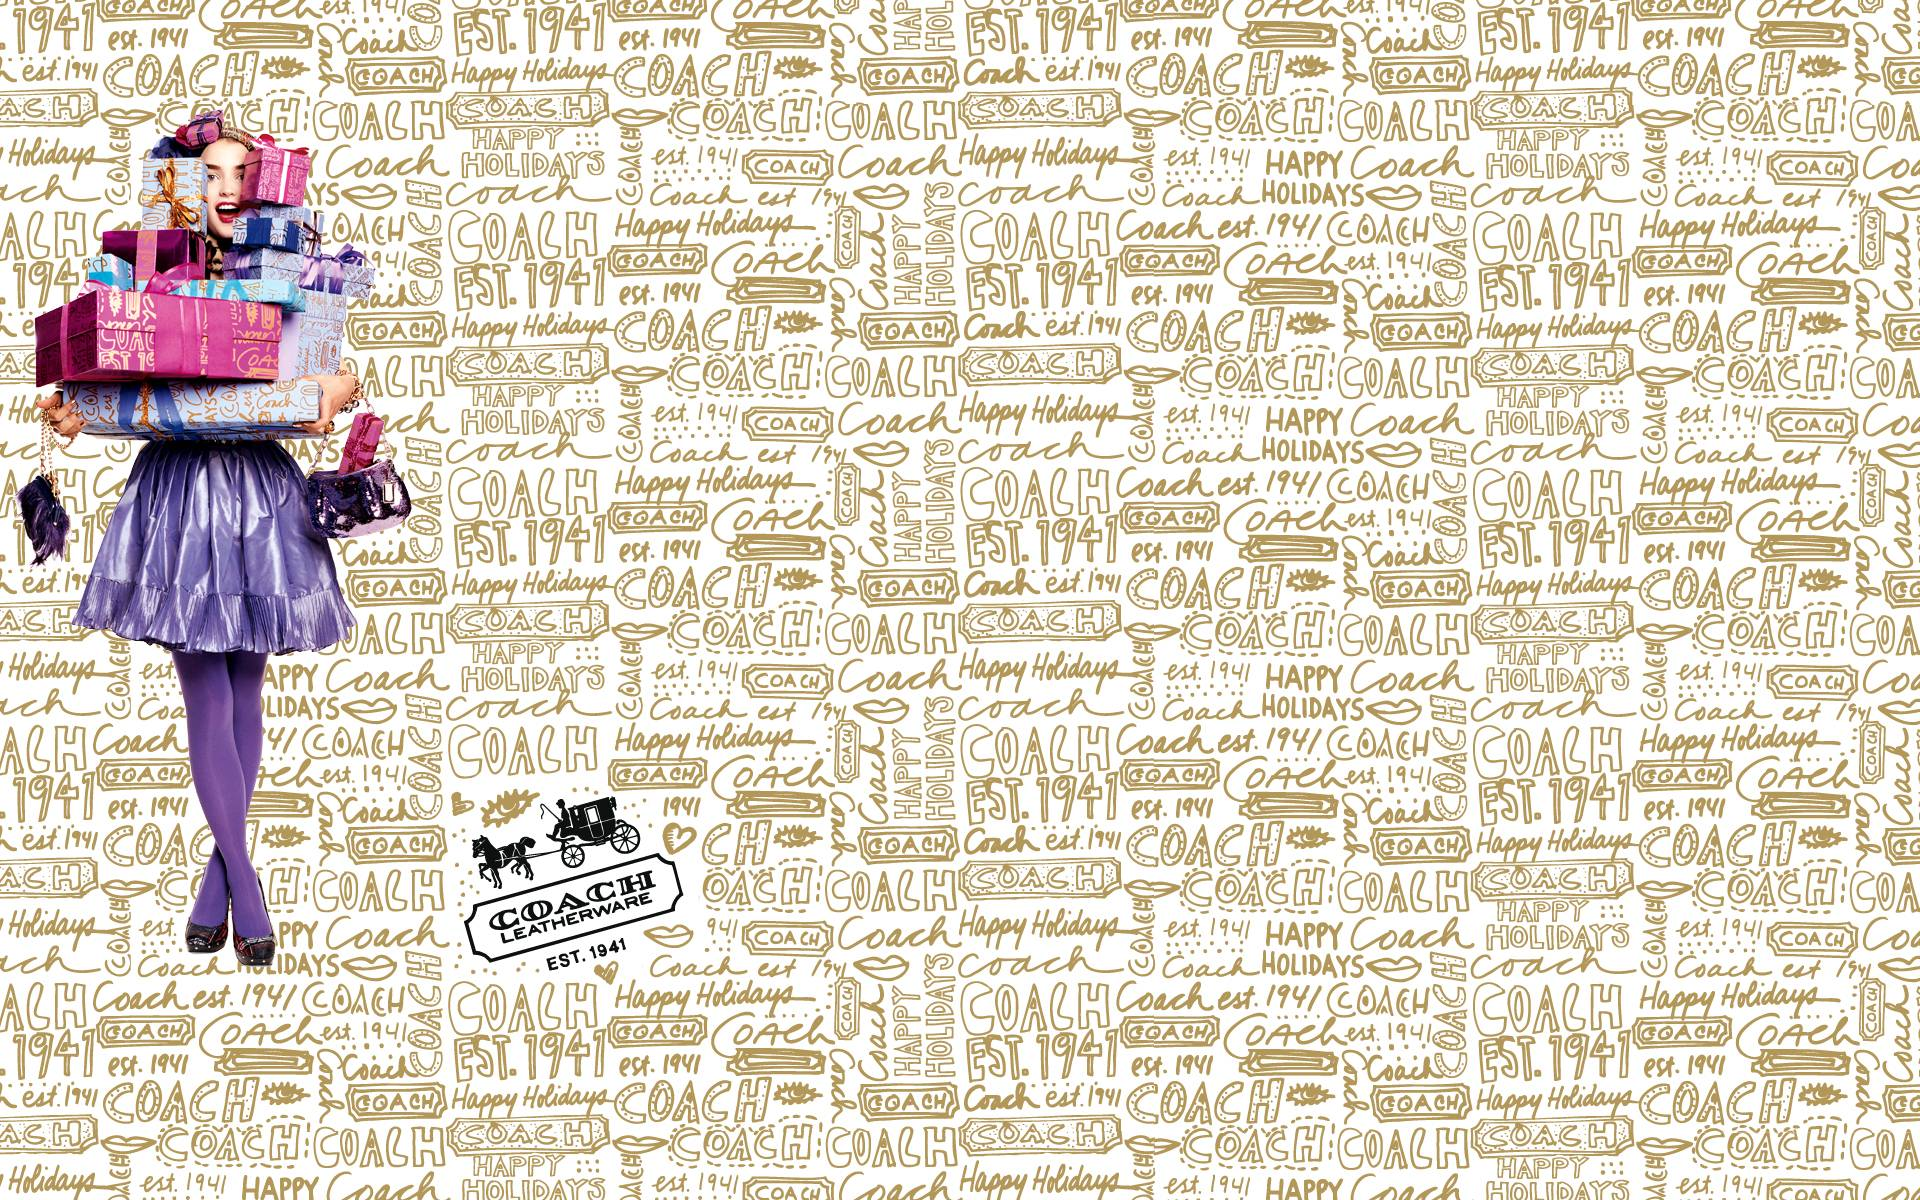 Coach Desktop Wallpapers - Wallpaper Cave